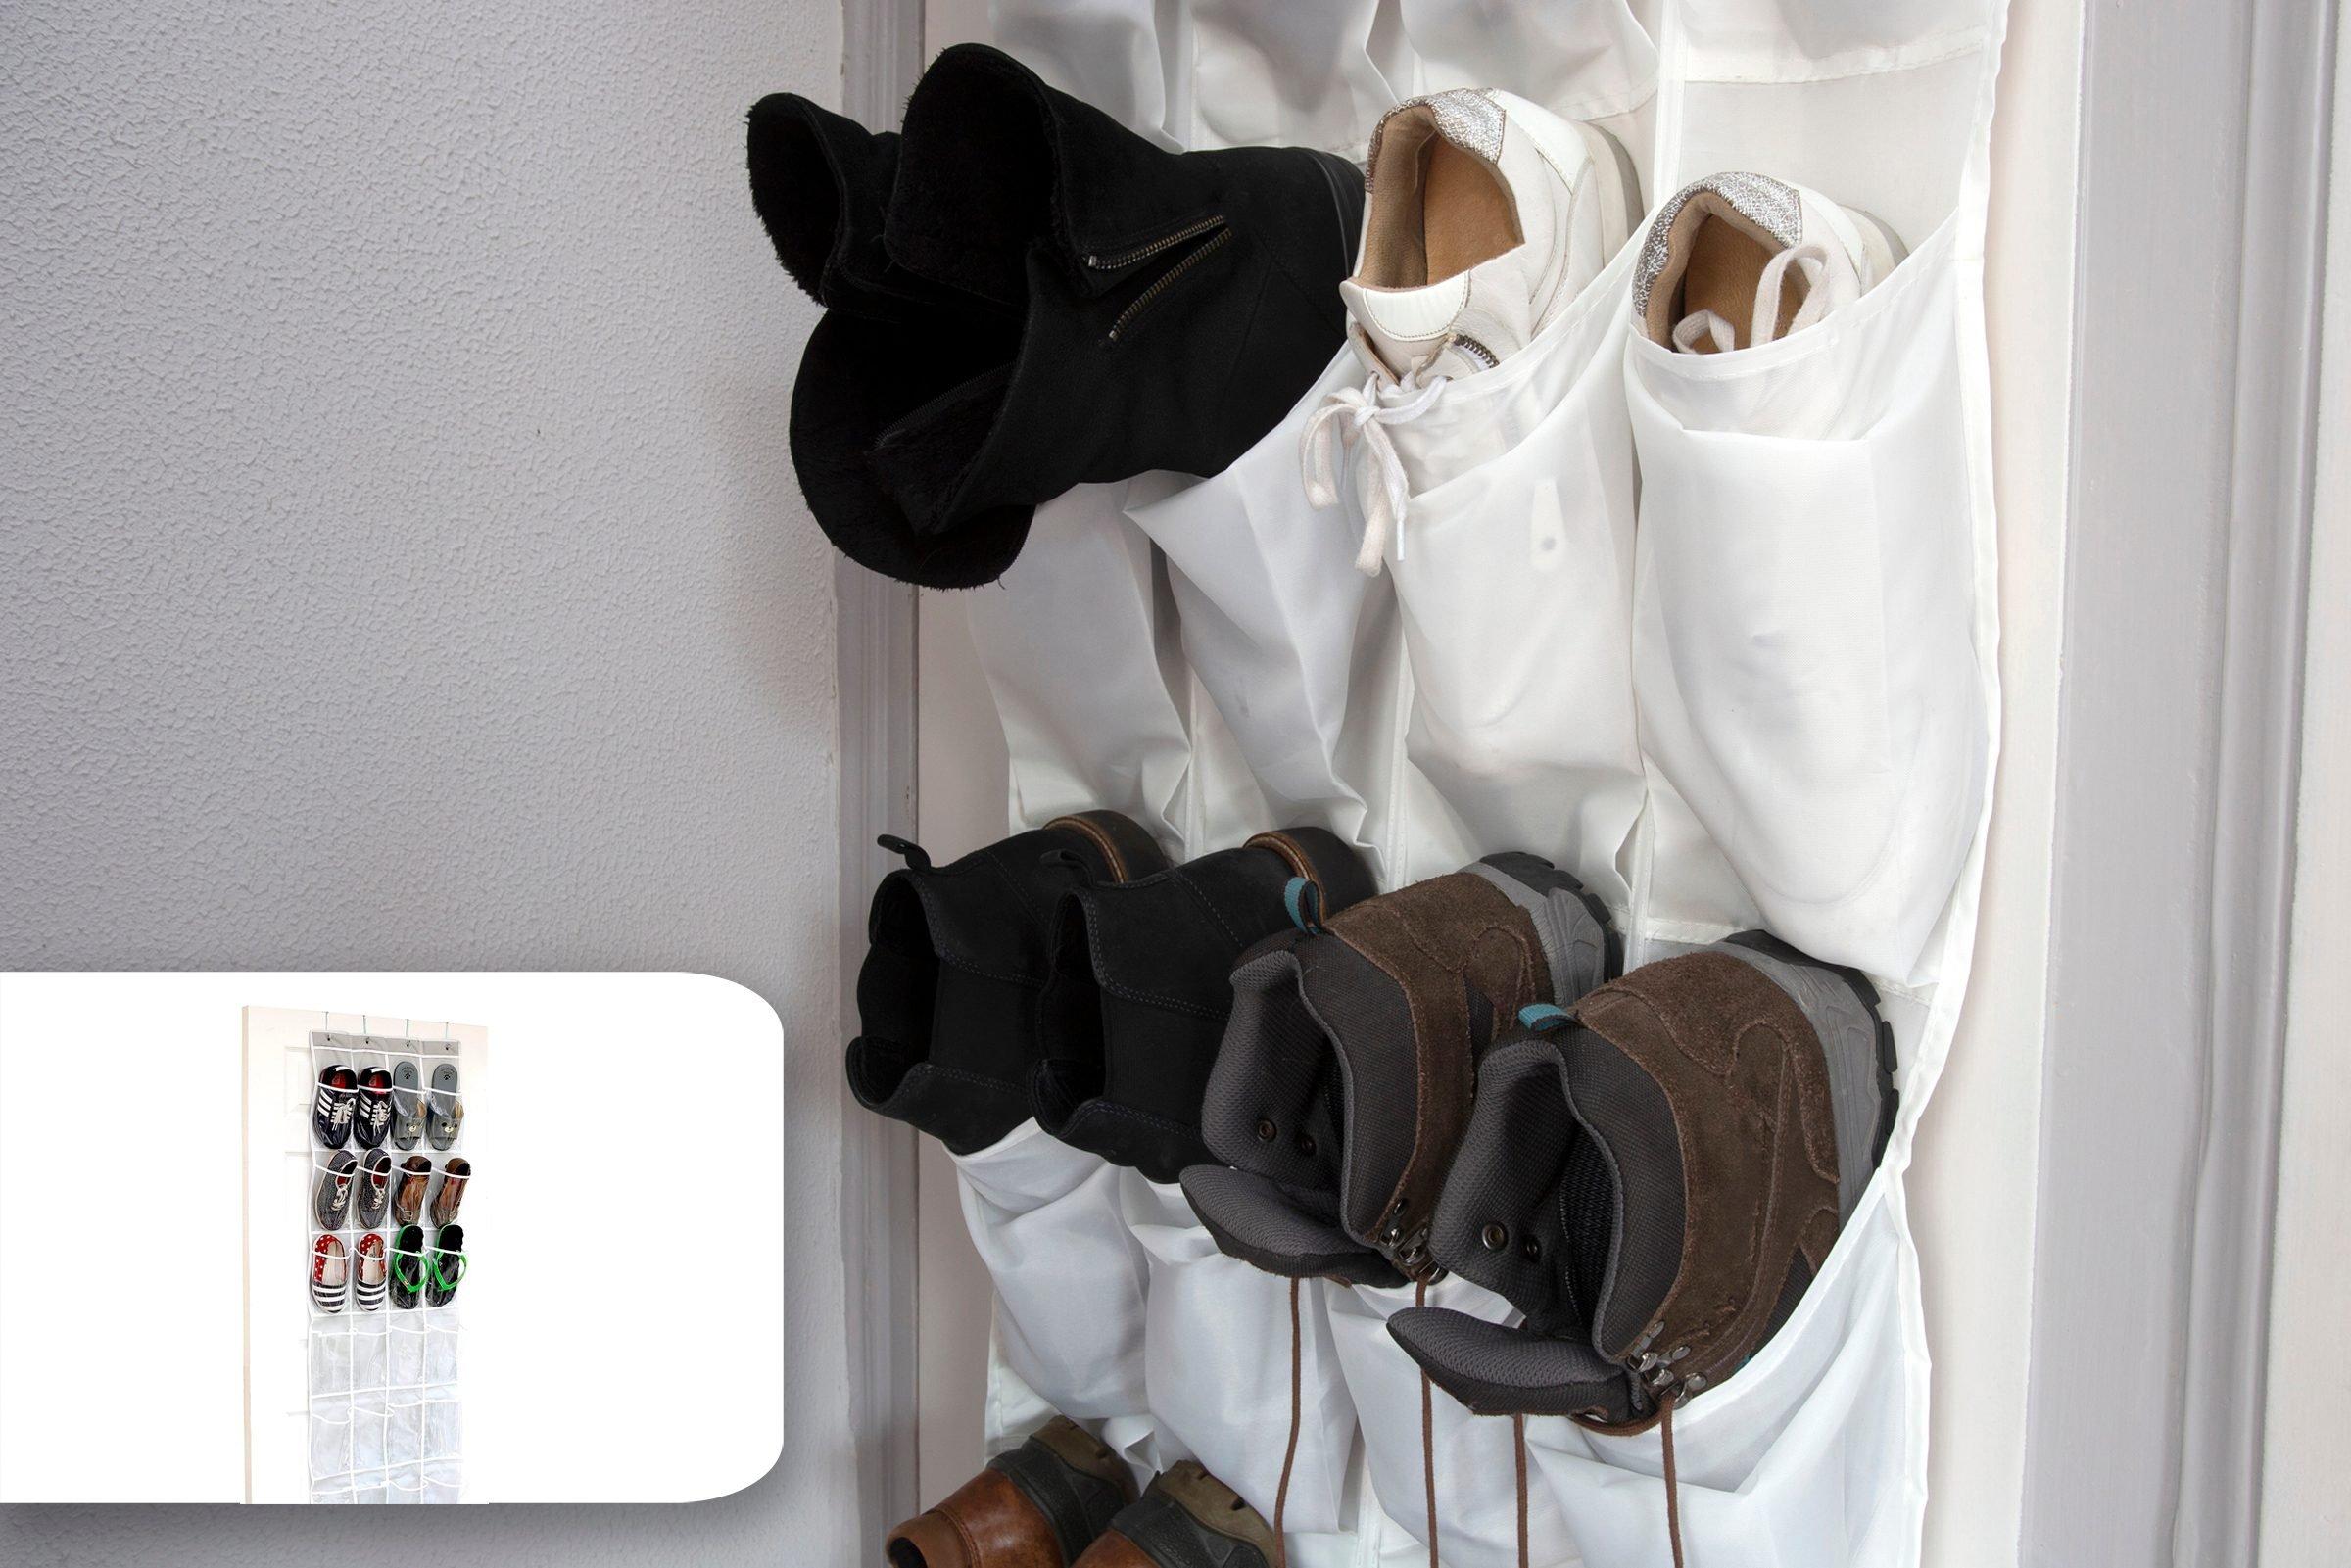 small things shoes shoe rack organize amazon